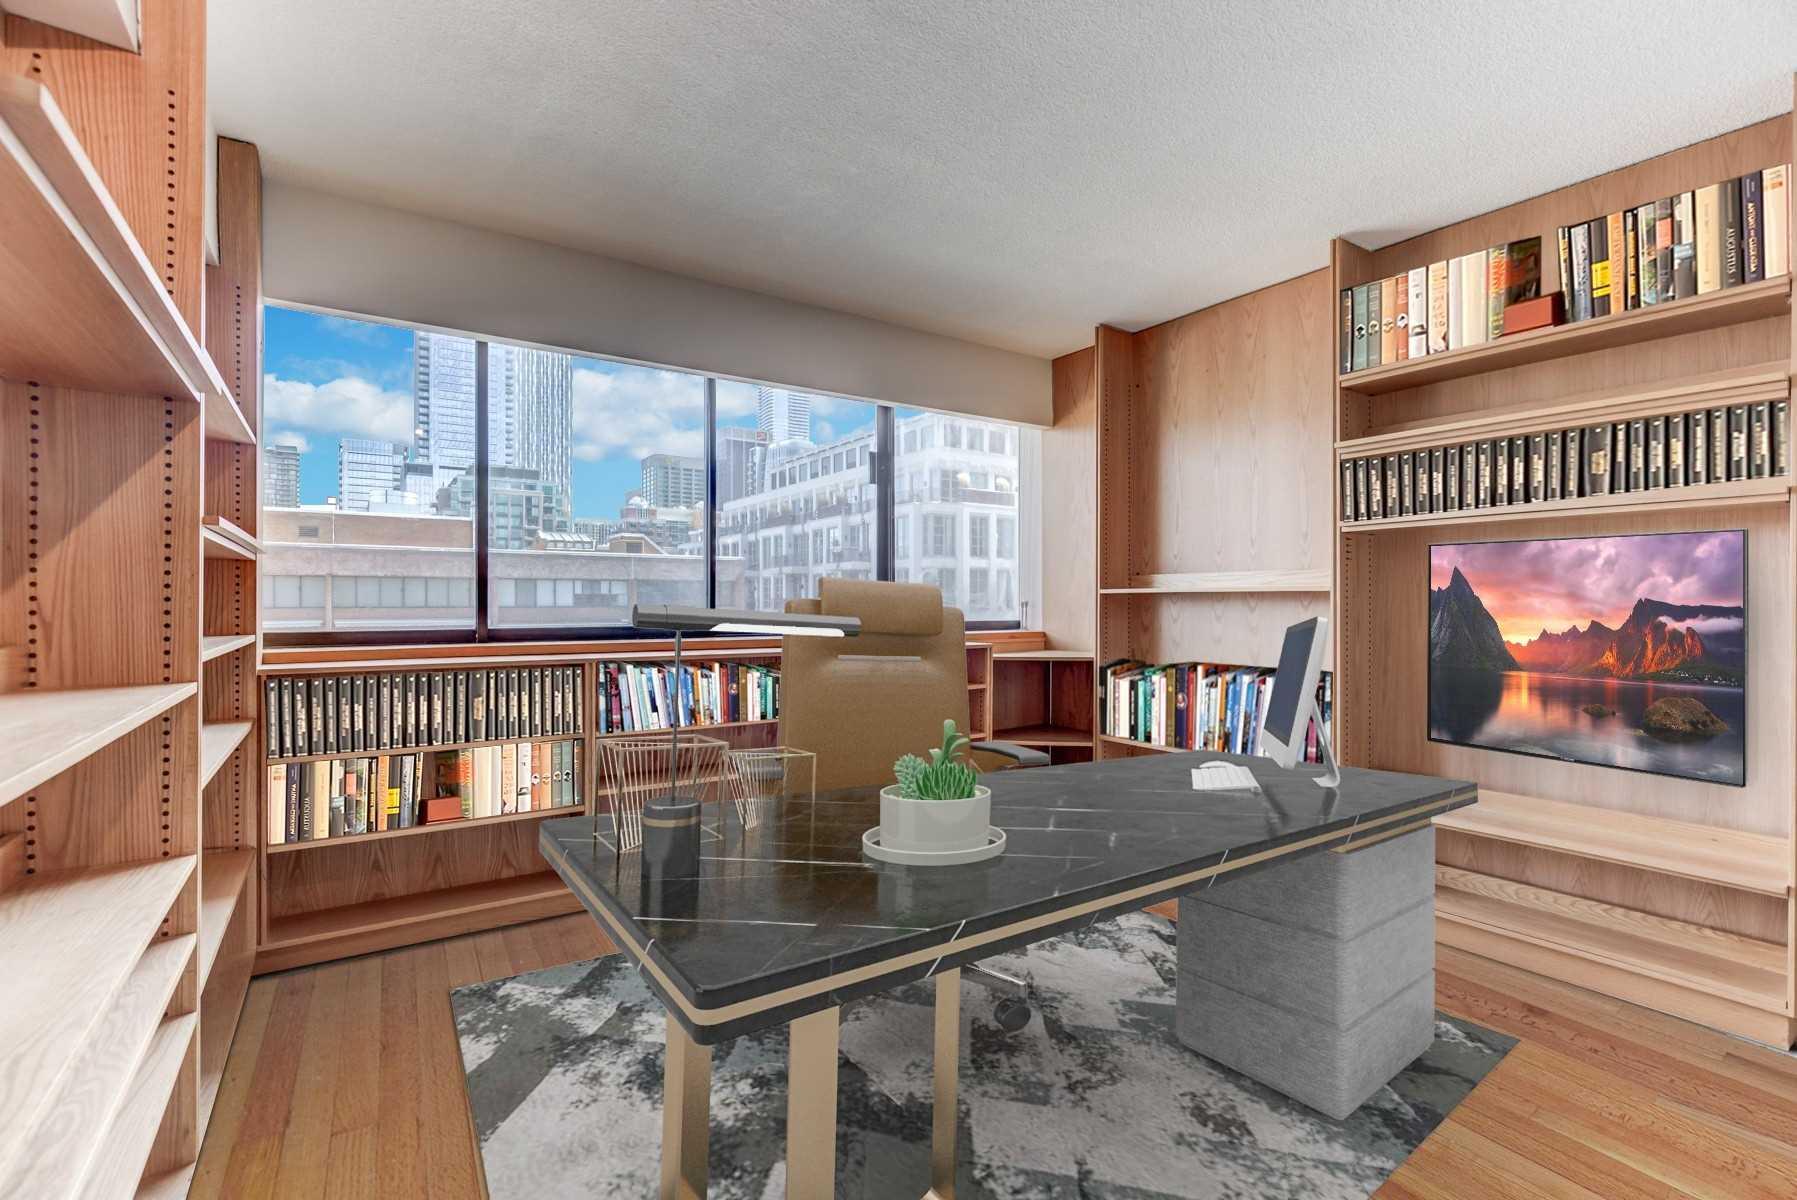 607 - 55A Avenue Rd - Annex Condo Apt for sale, 2 Bedrooms (C5185690) - #7